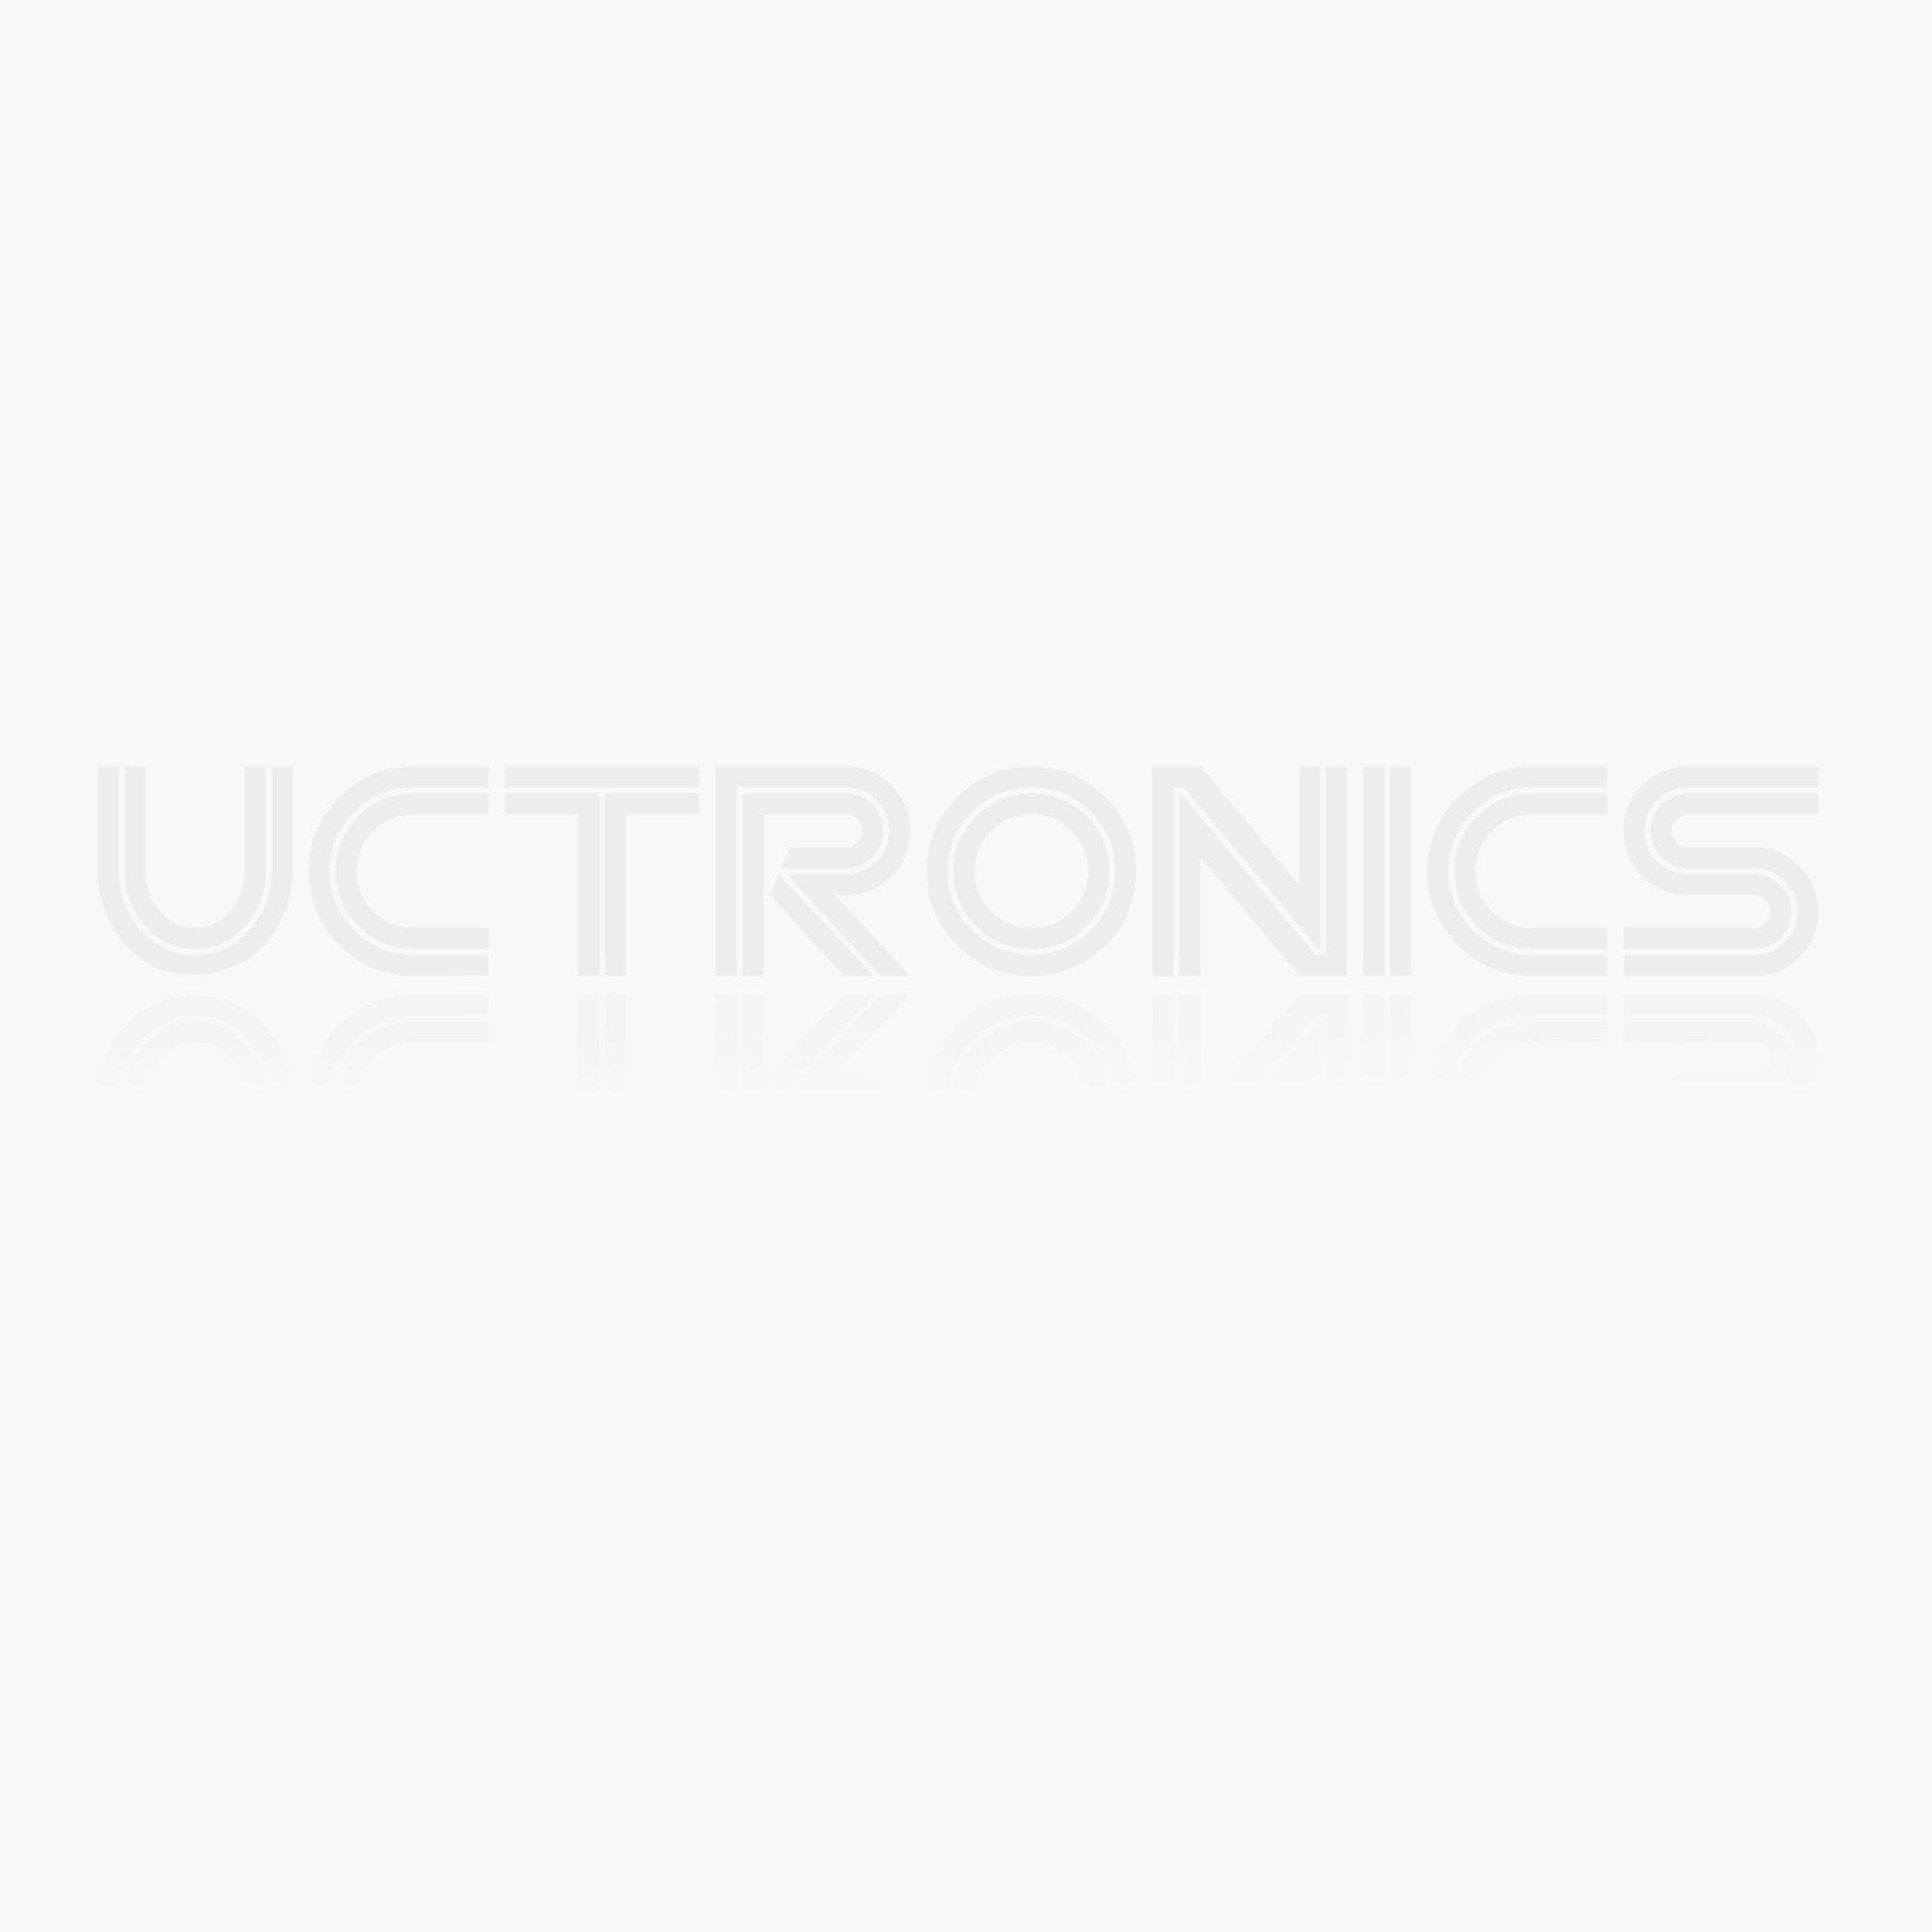 Stereo Camera for Raspberry Pi (Sony IMX219 8 Megapixel)